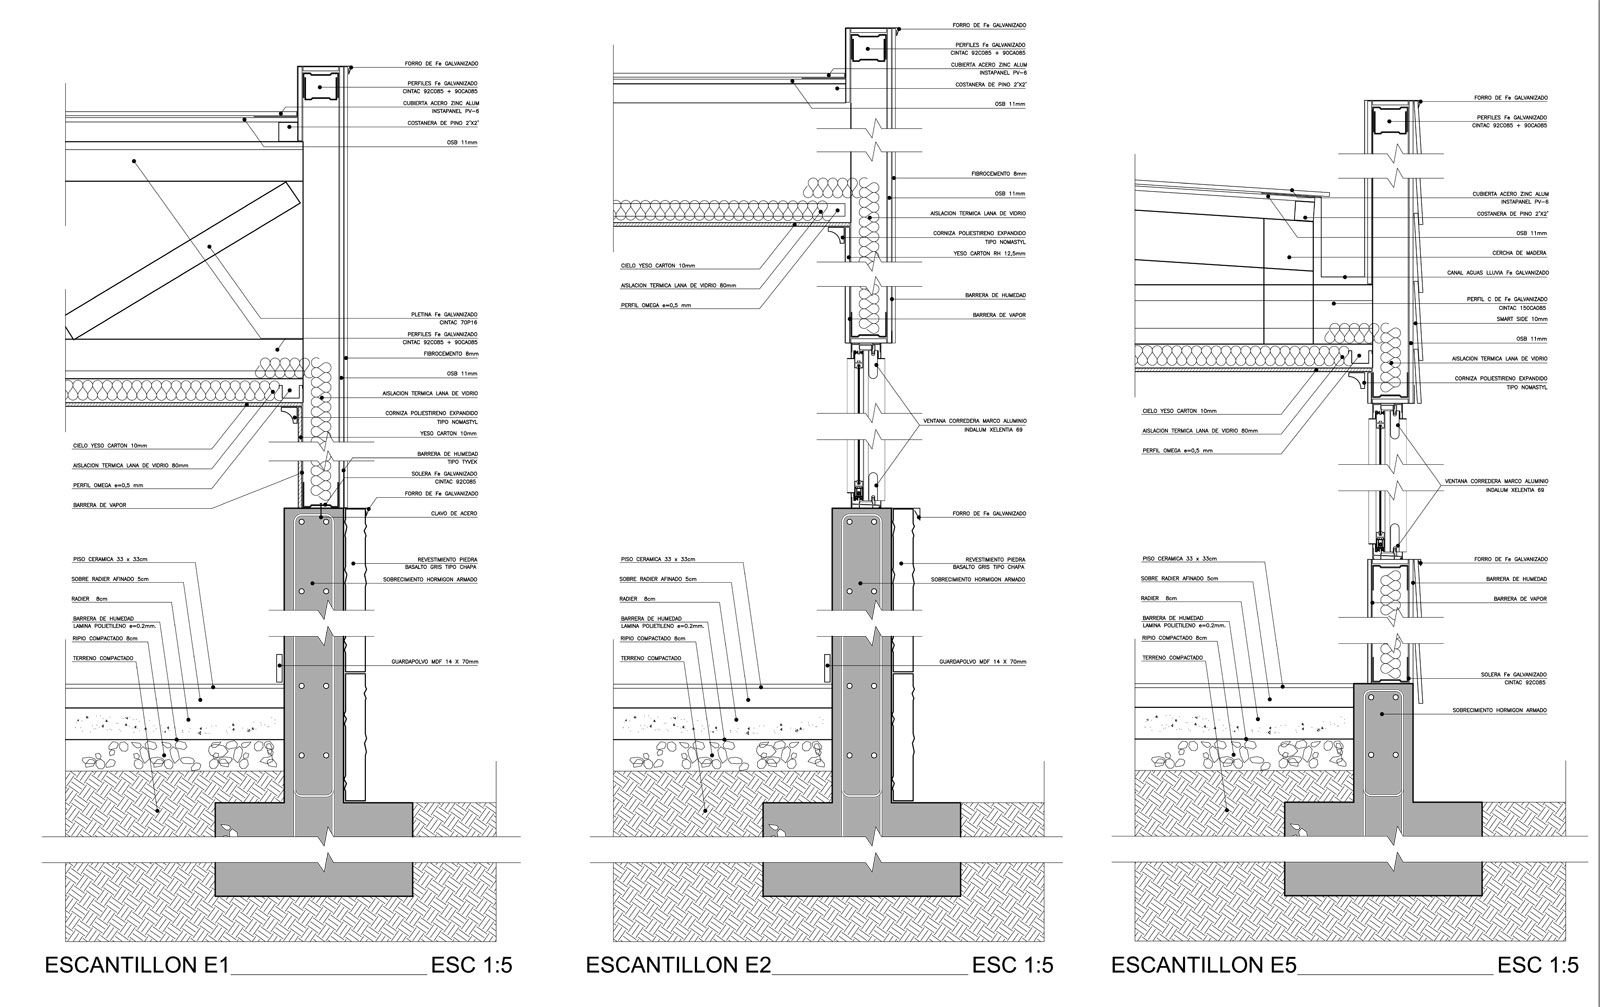 Dibujo t cnico la escala mvblogmvblog for Piso tecnico detalle